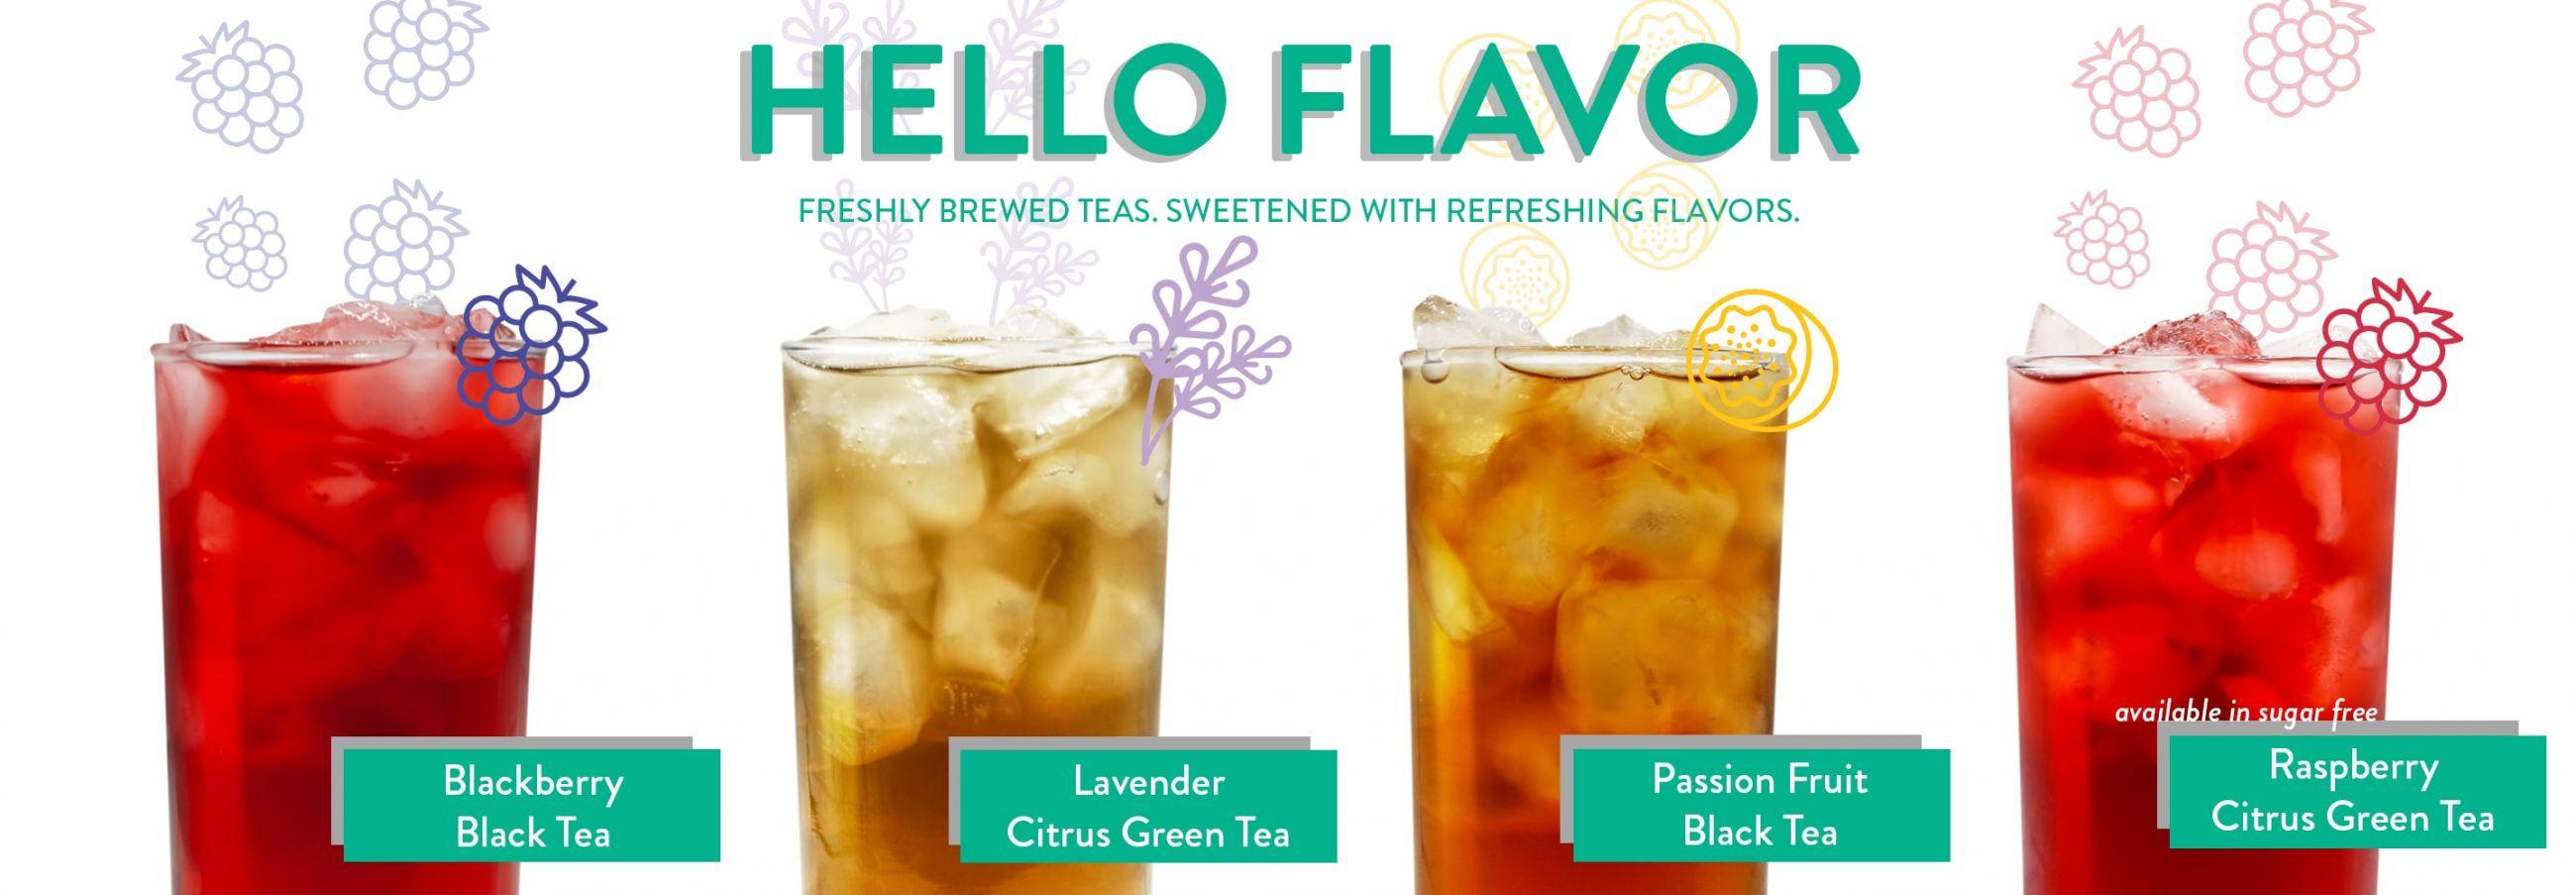 Photo of Ziggi's freshly brewed iced tea flavors in a row: Blackberry Black Tea, Lavender Citrus Green Tea, Passion Fruit Black Tea, Raspberry Citrus Green Tea